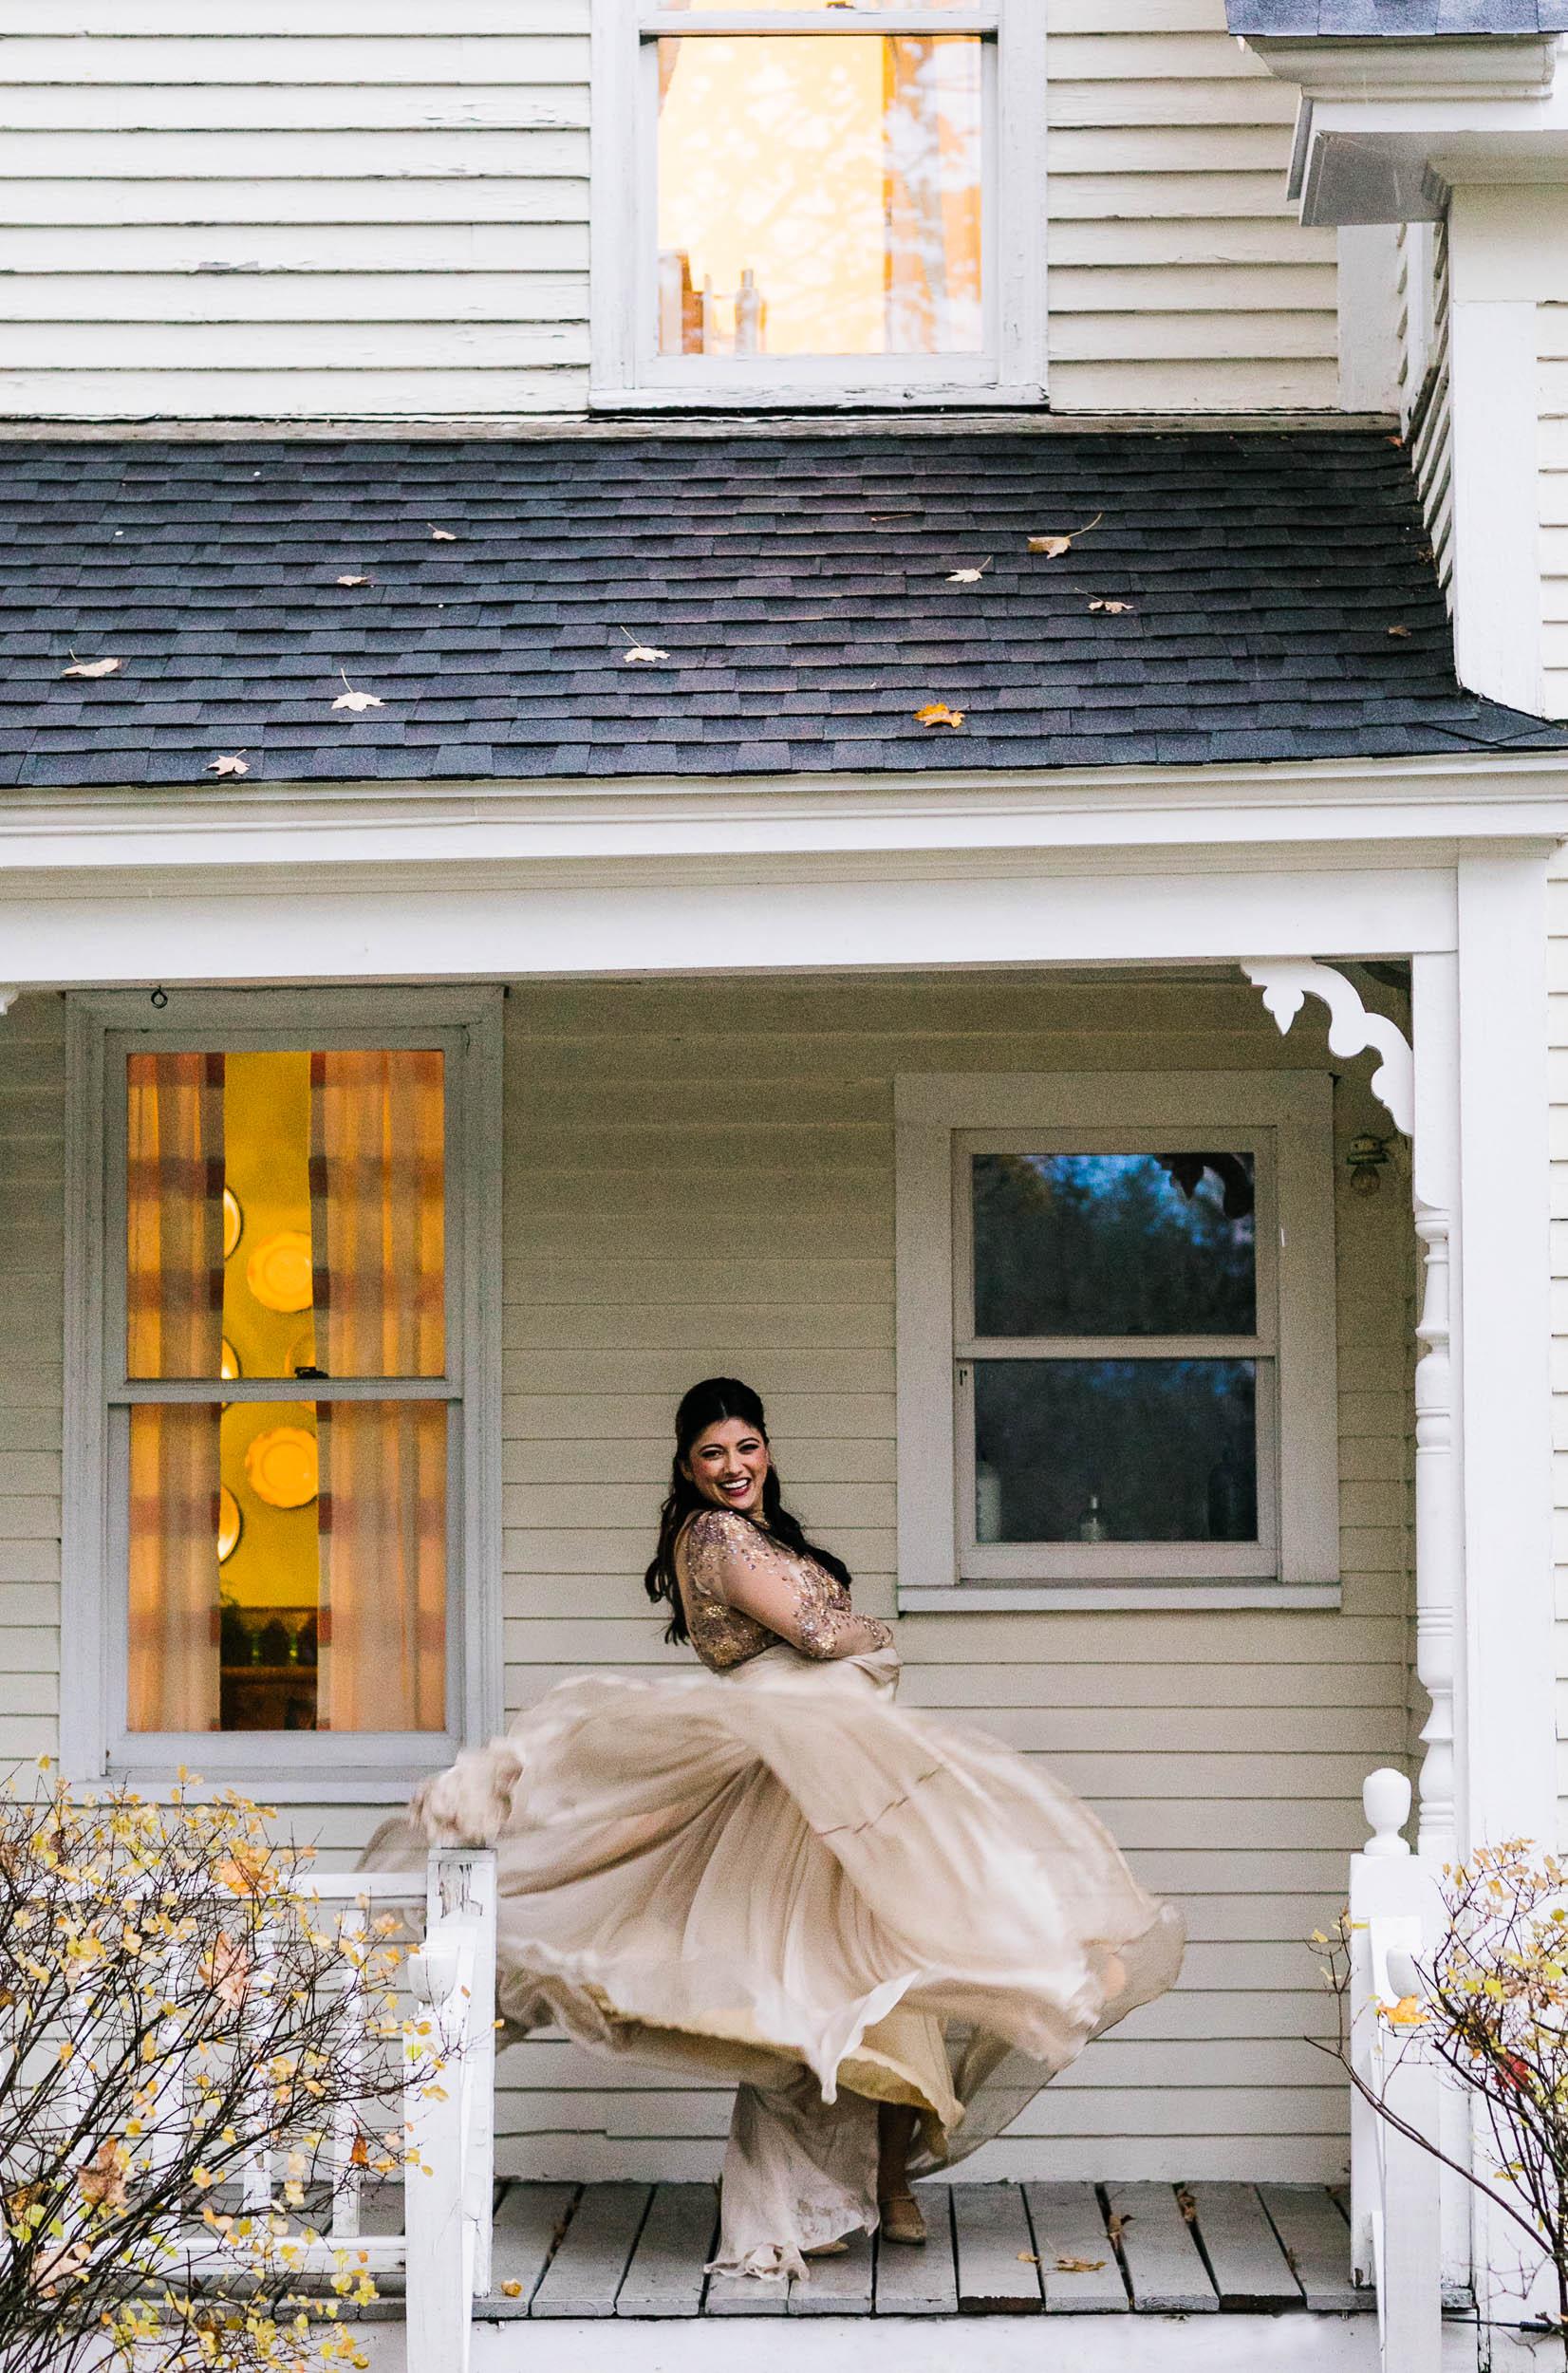 J+J_Barn at Walnut Hill_Portland Maine Wedding_Buena Lane Photography_102718_ER_457-Edit.jpg